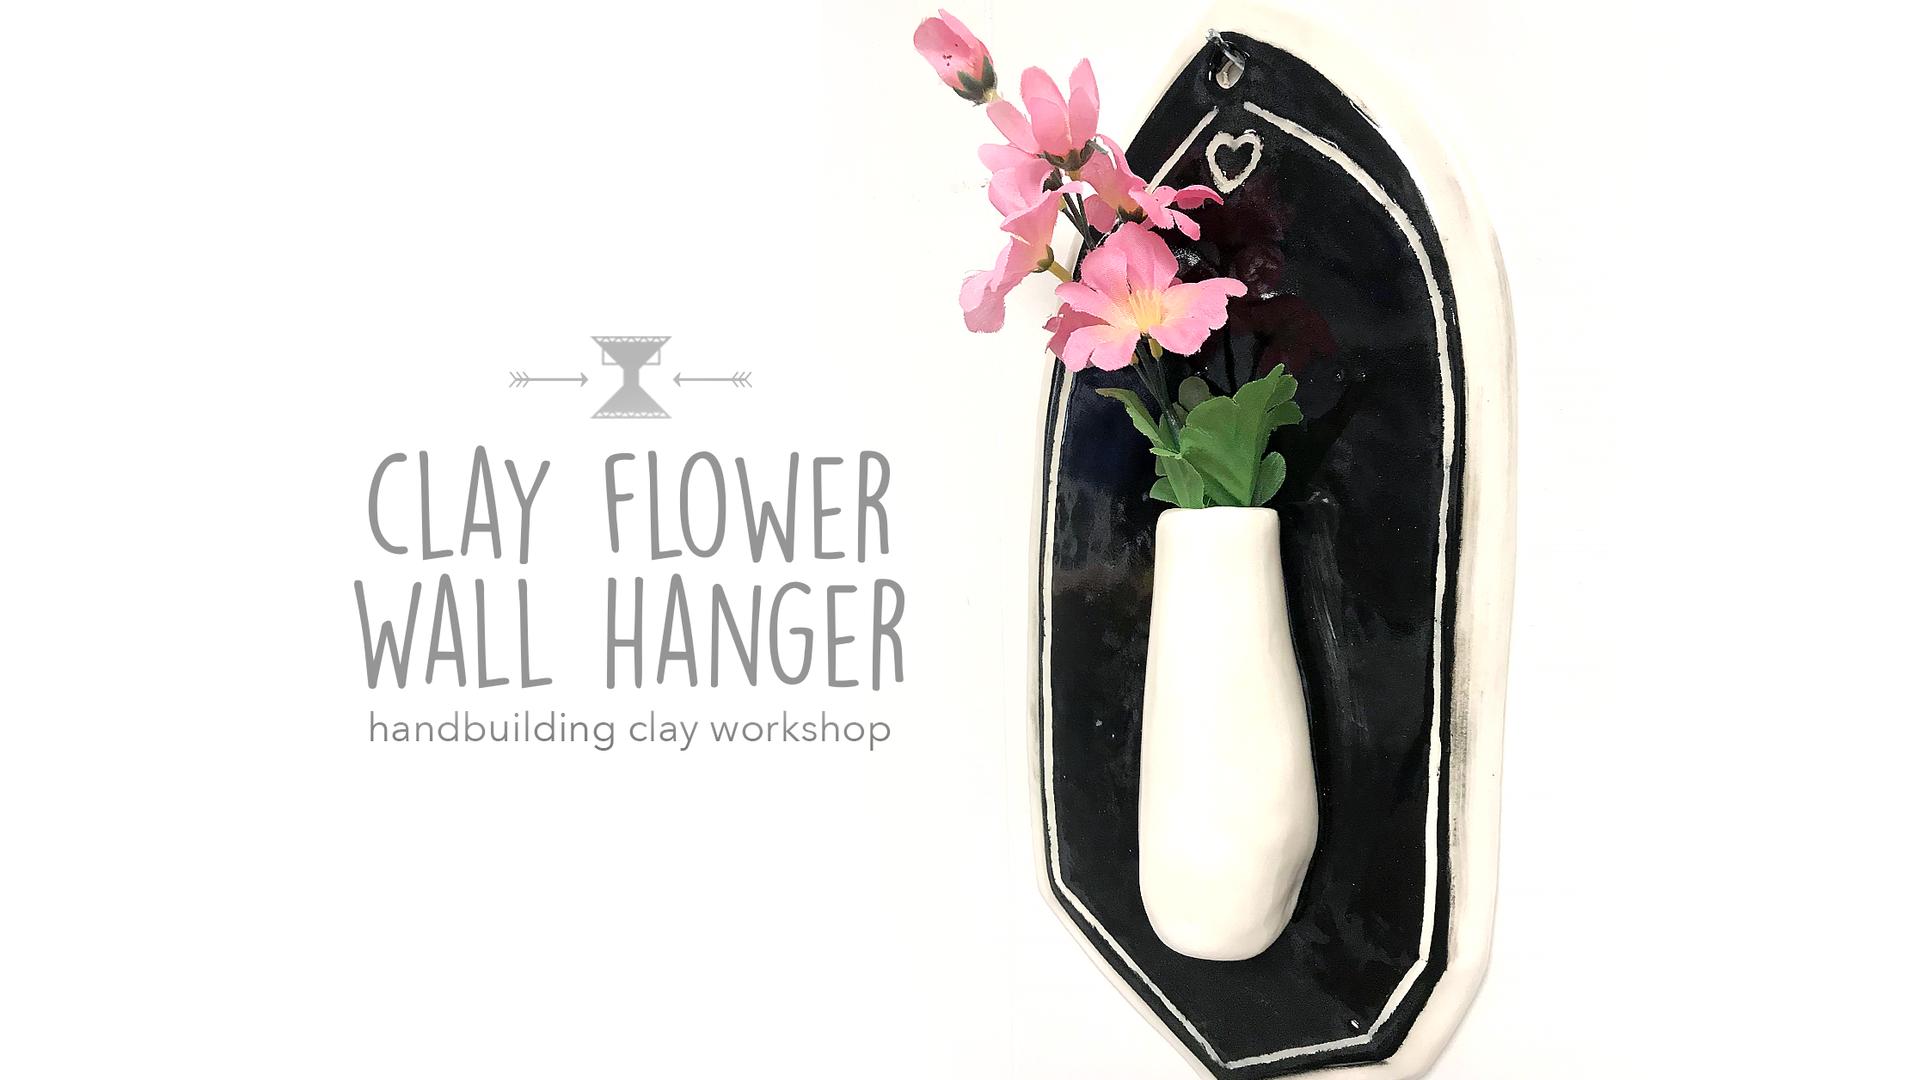 Clay Flower Wall Hanger